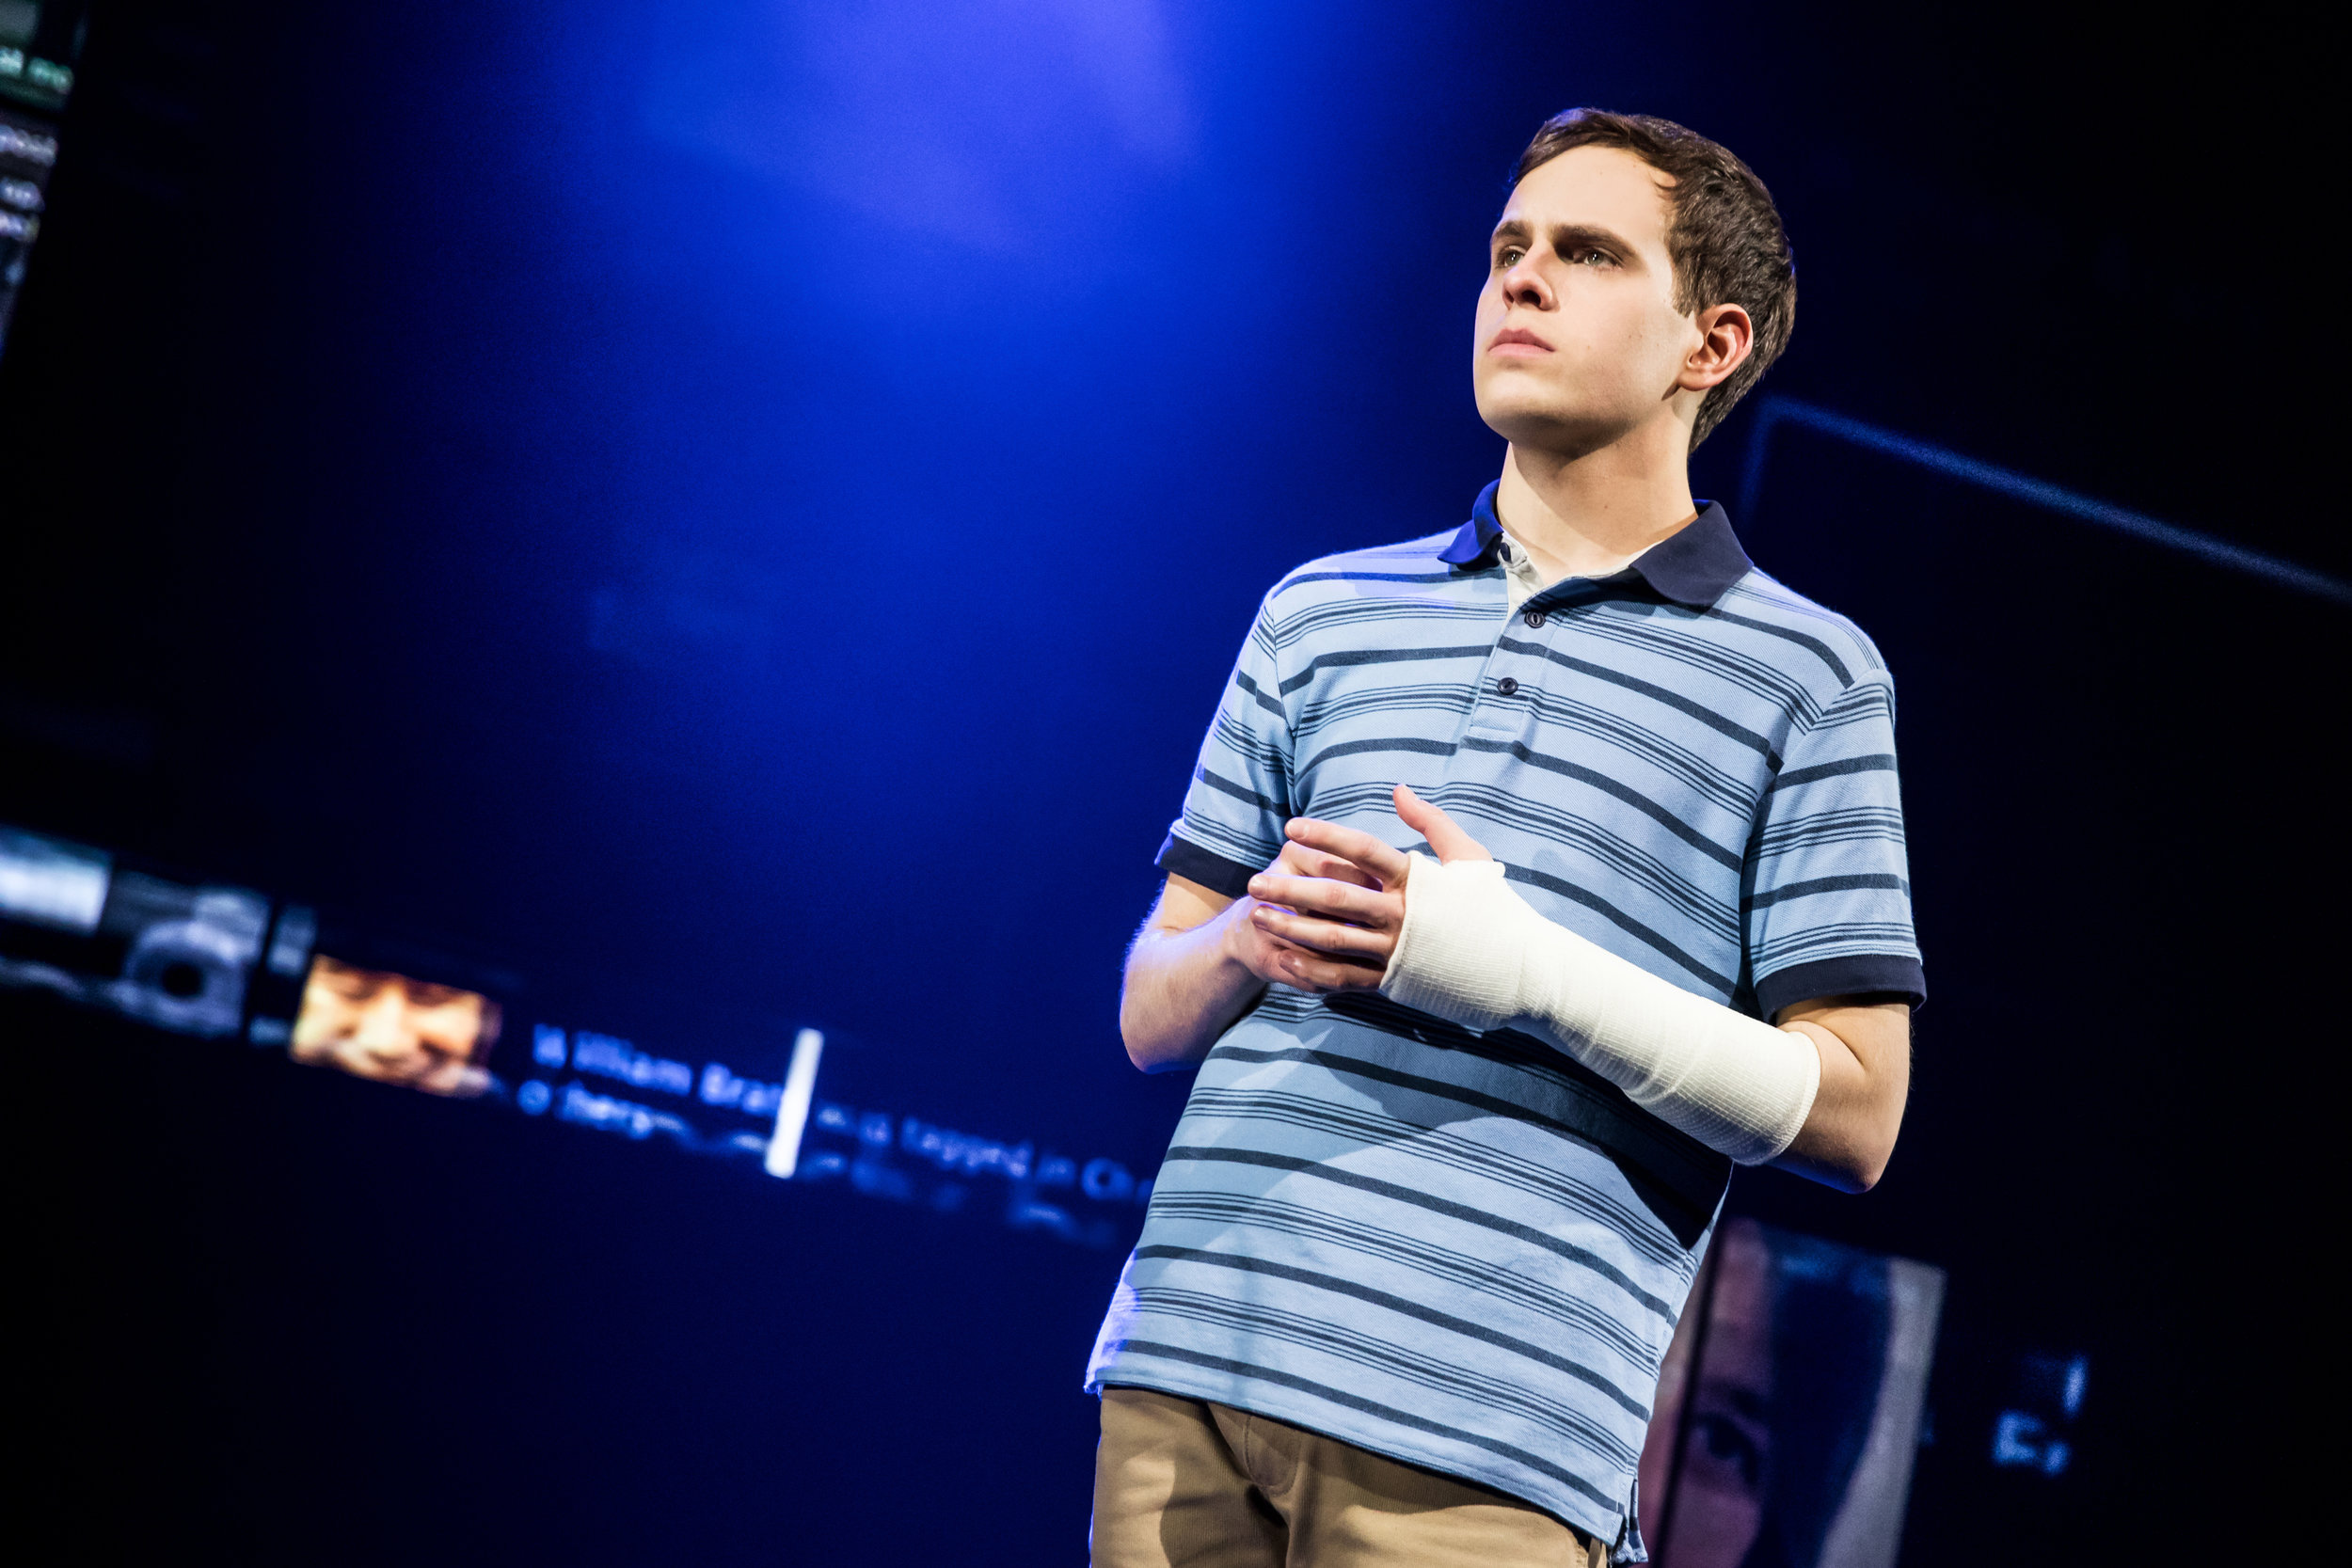 Dear-Evan-Hansen-Taylor-Trensch-0827-Photo-Credit-Matthew-Murphy.jpg